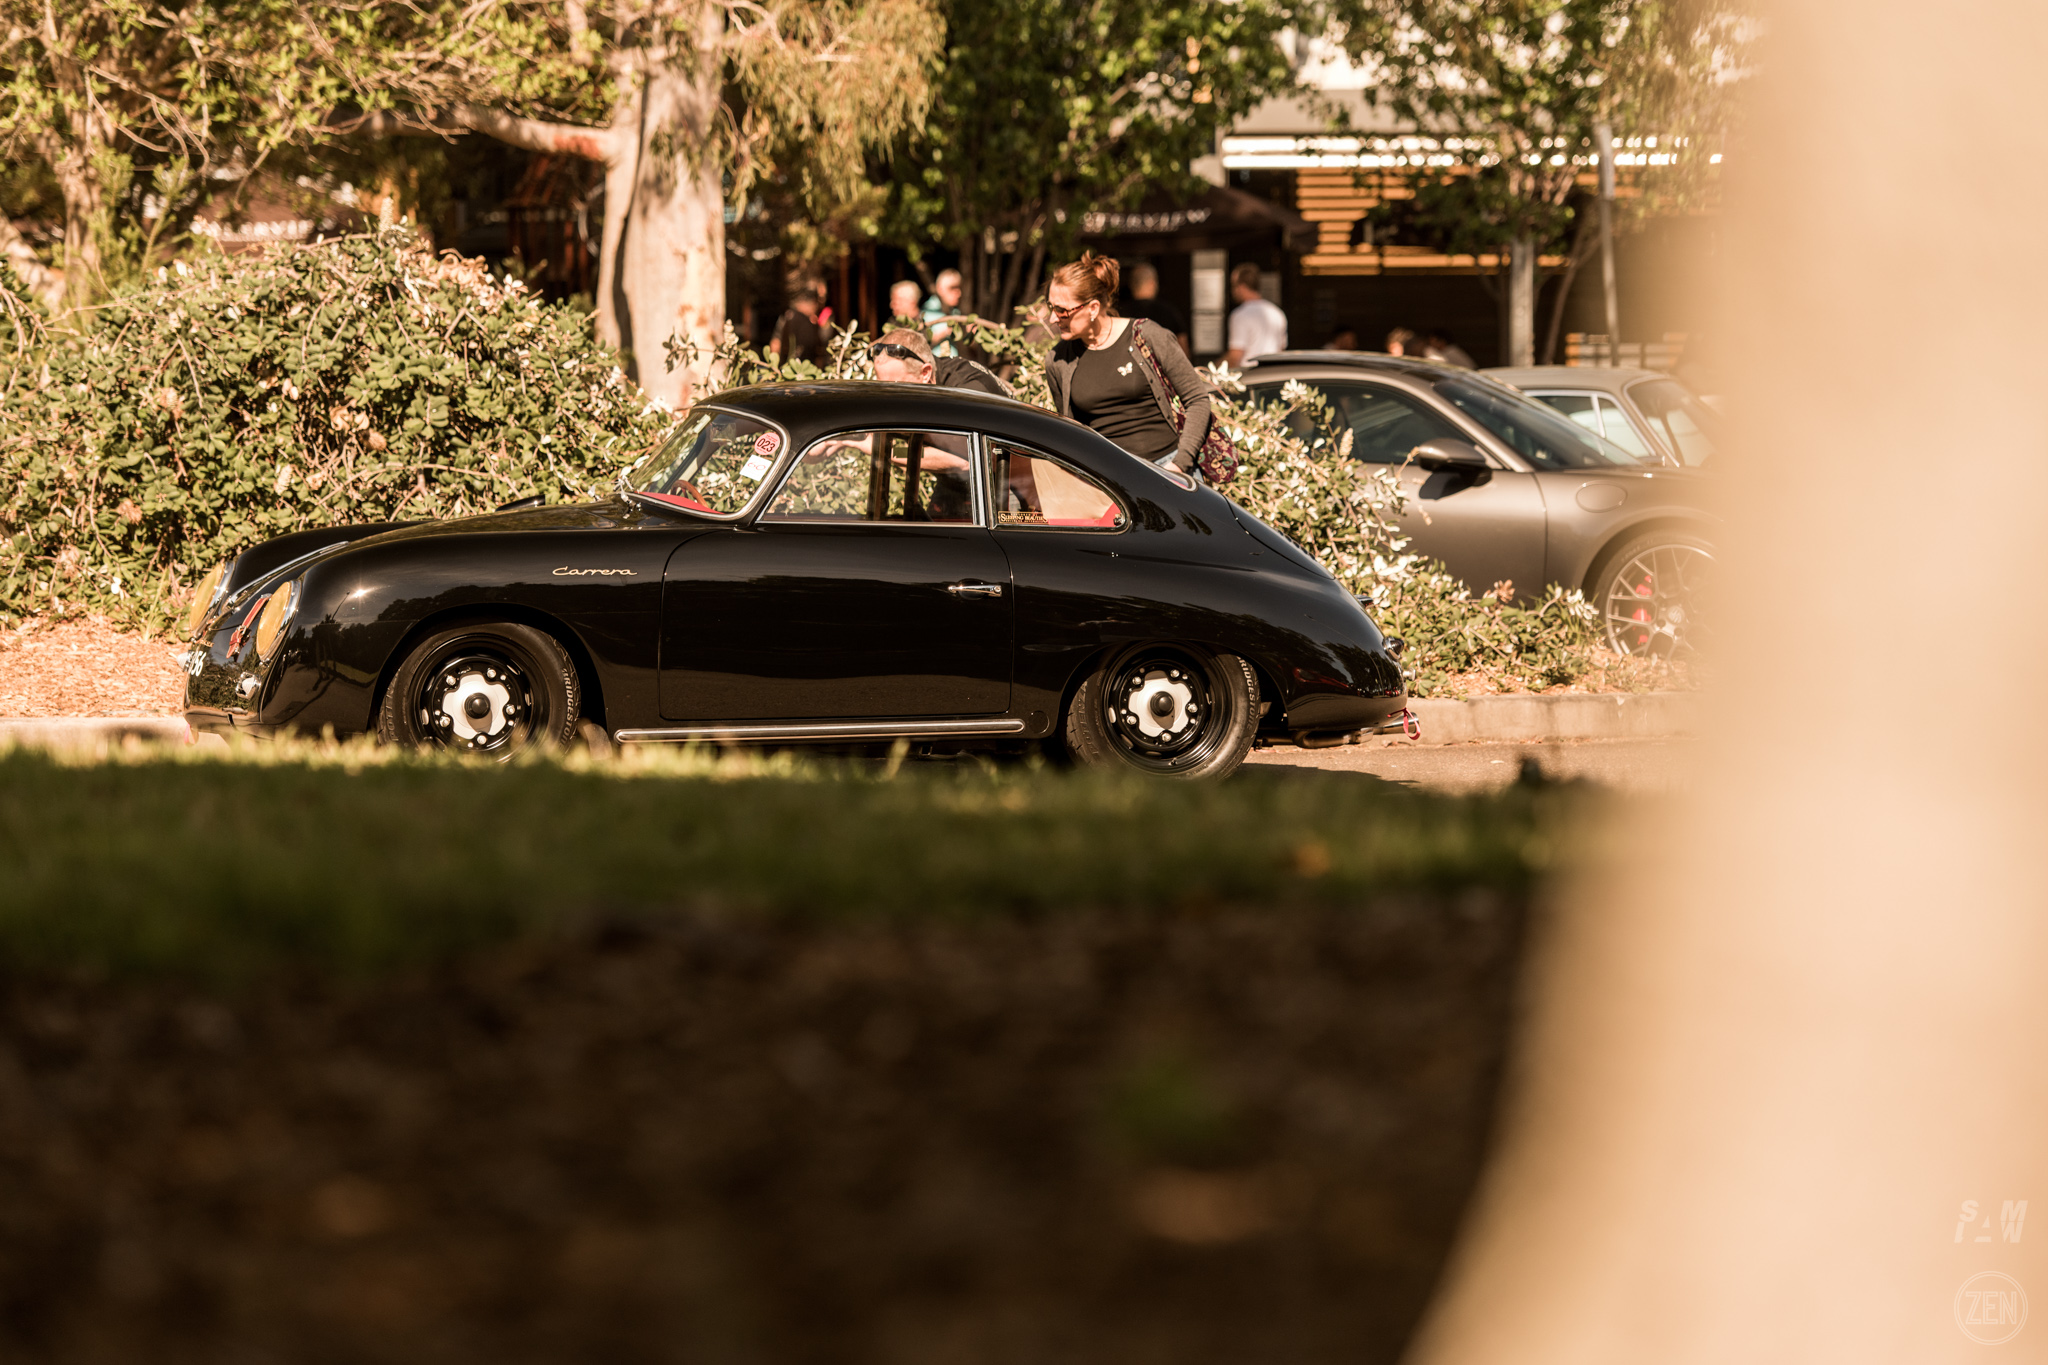 2019-10-27 - Autohaus Porsches & Coffee 179